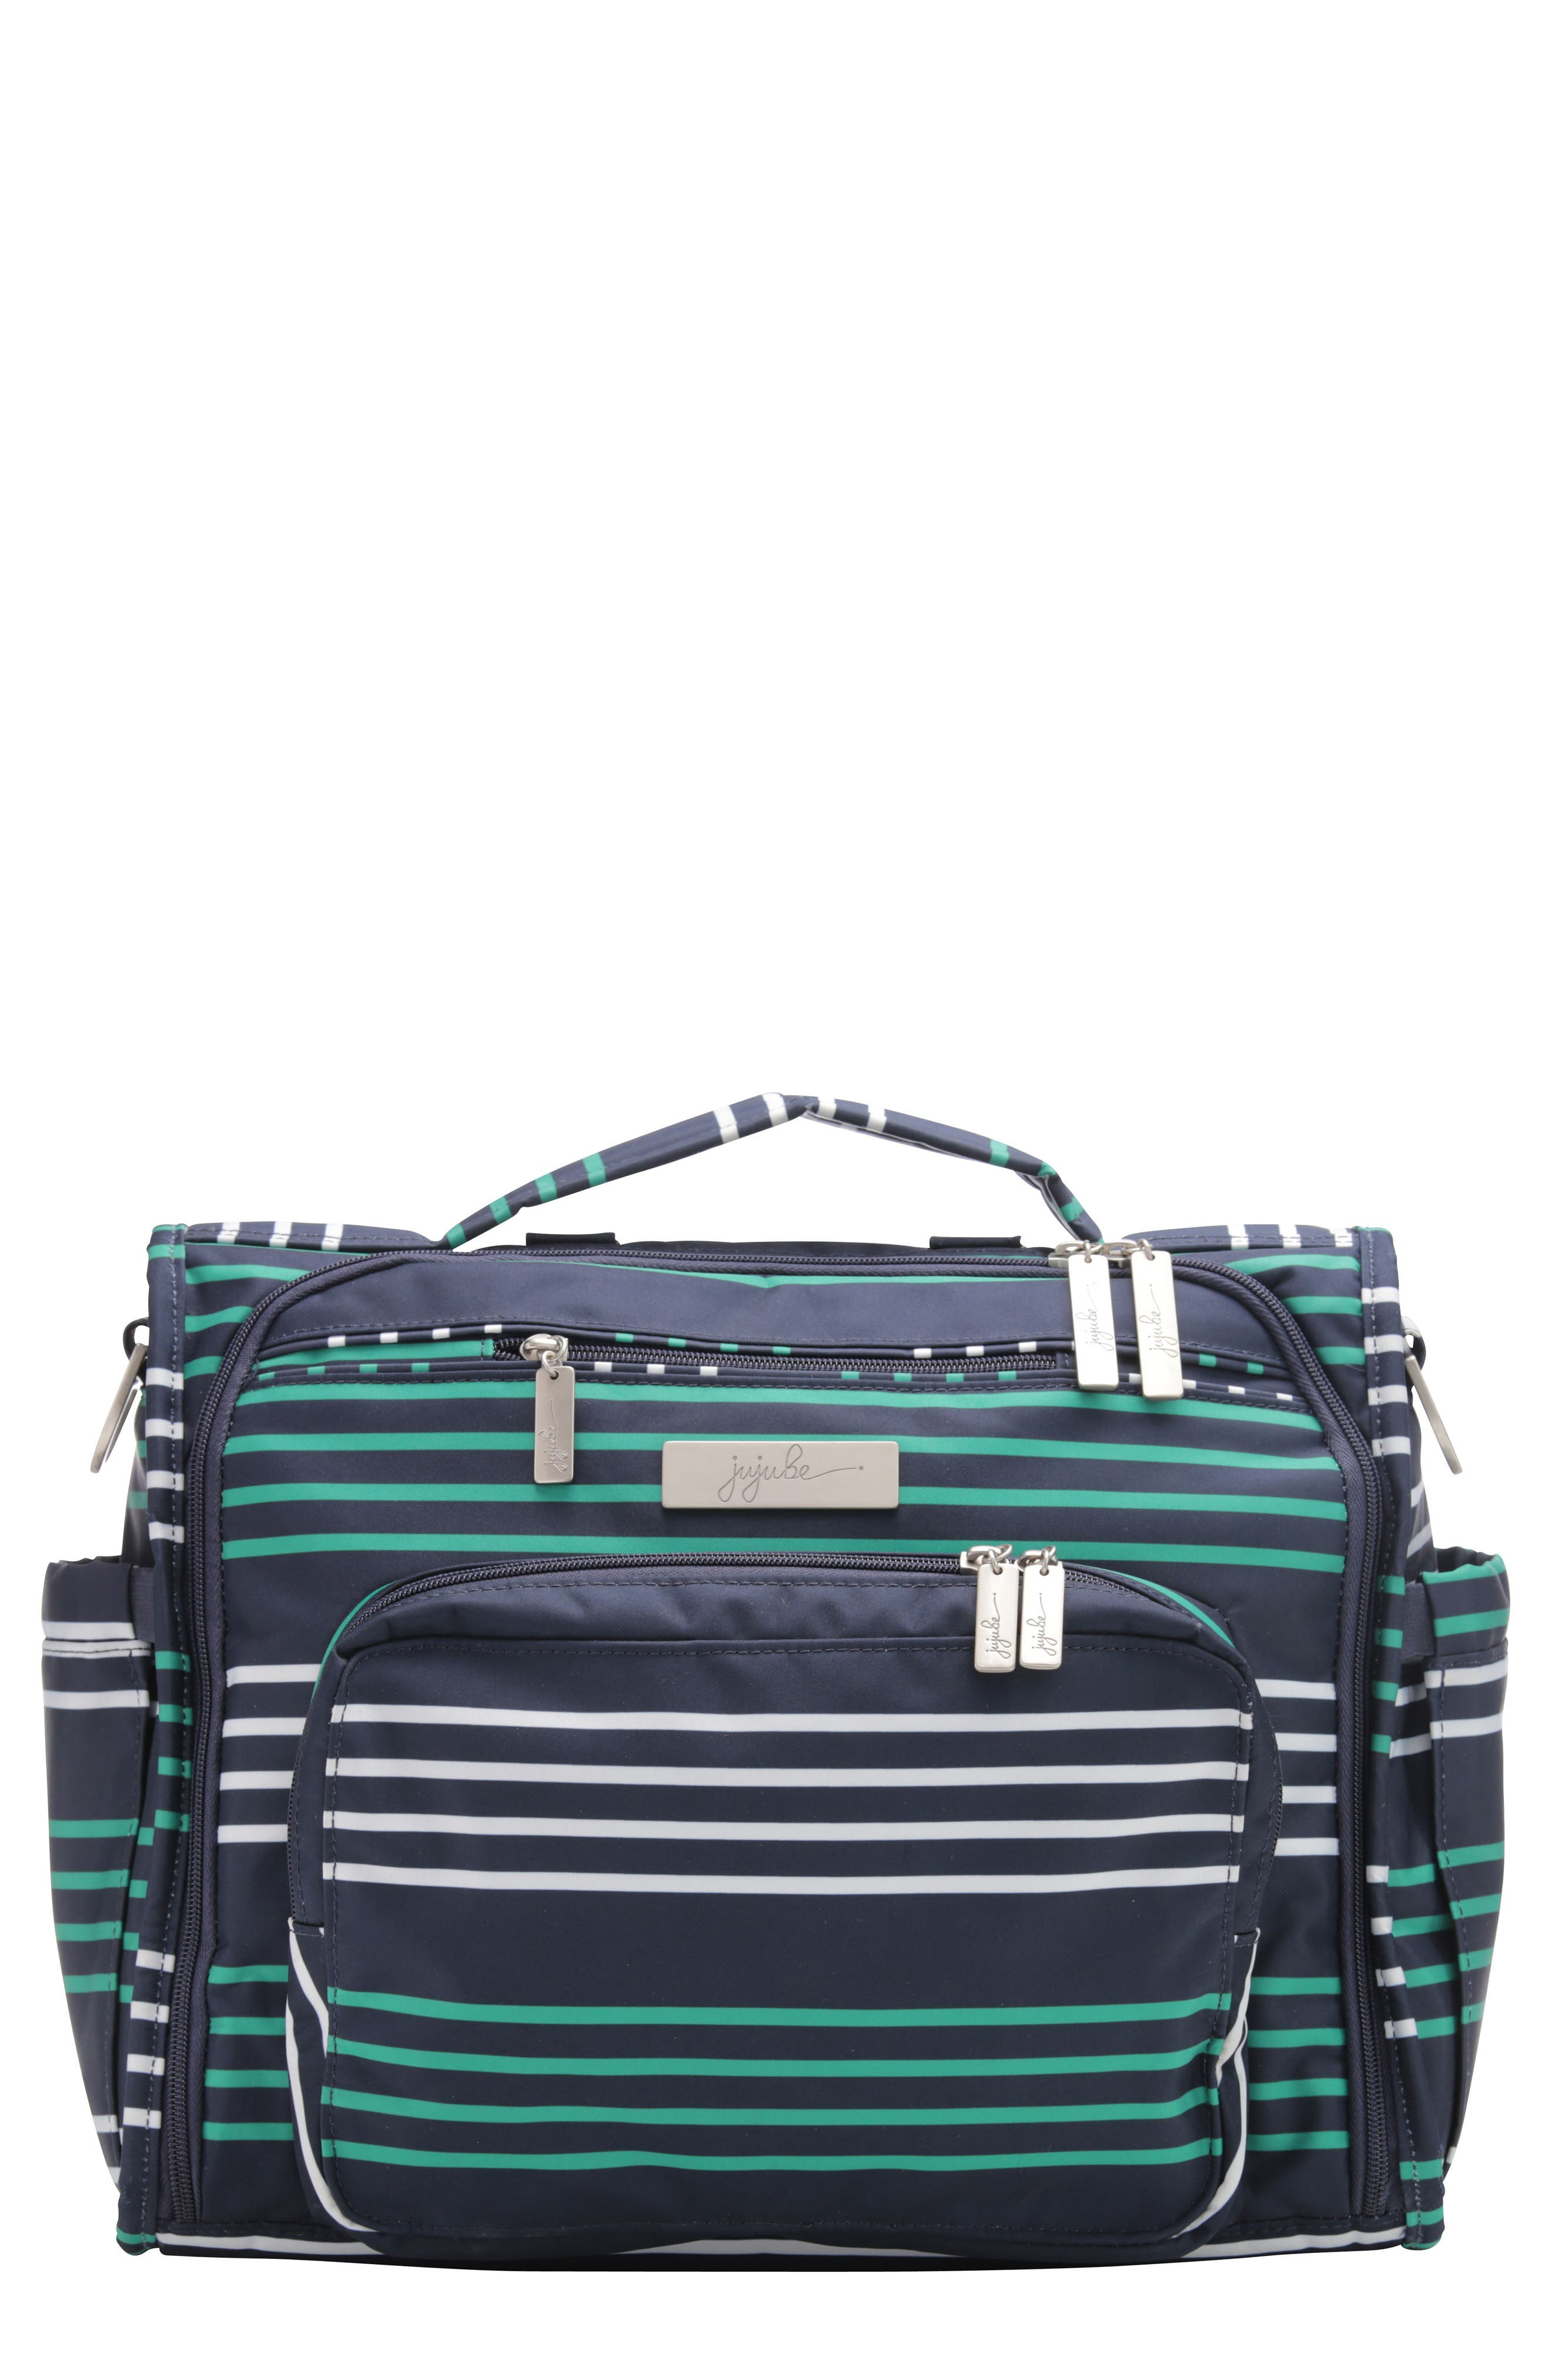 BFF - Coastal Collection Diaper Bag,                             Main thumbnail 4, color,